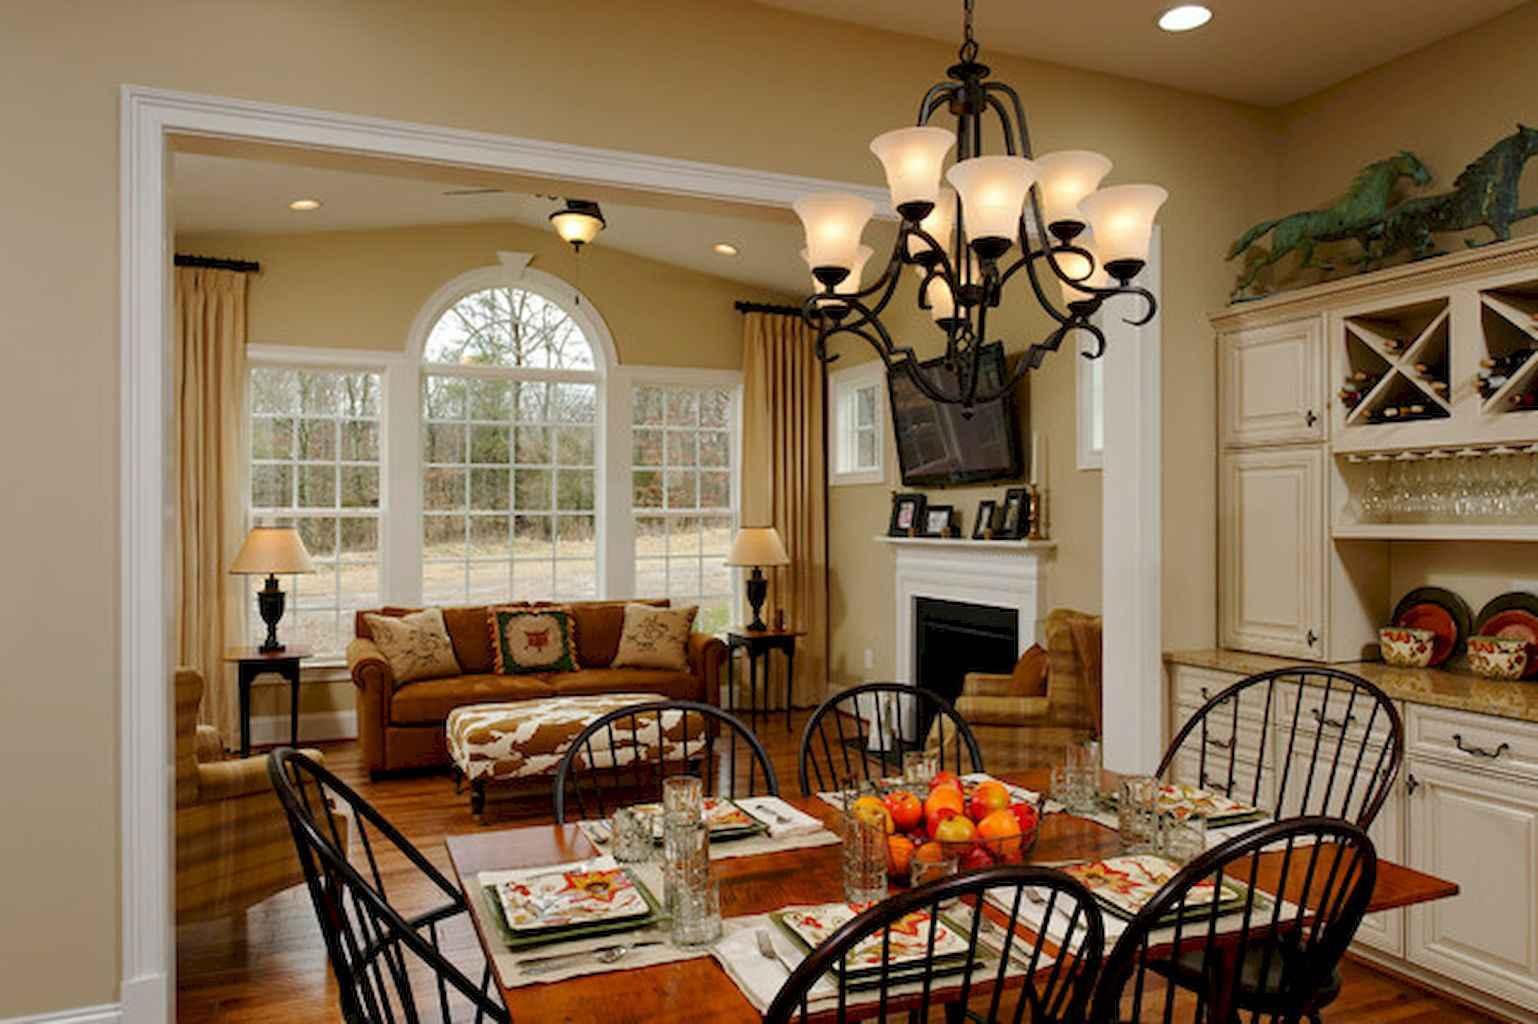 100 Rustic Farmhouse Dining Room Decor Ideas (52)